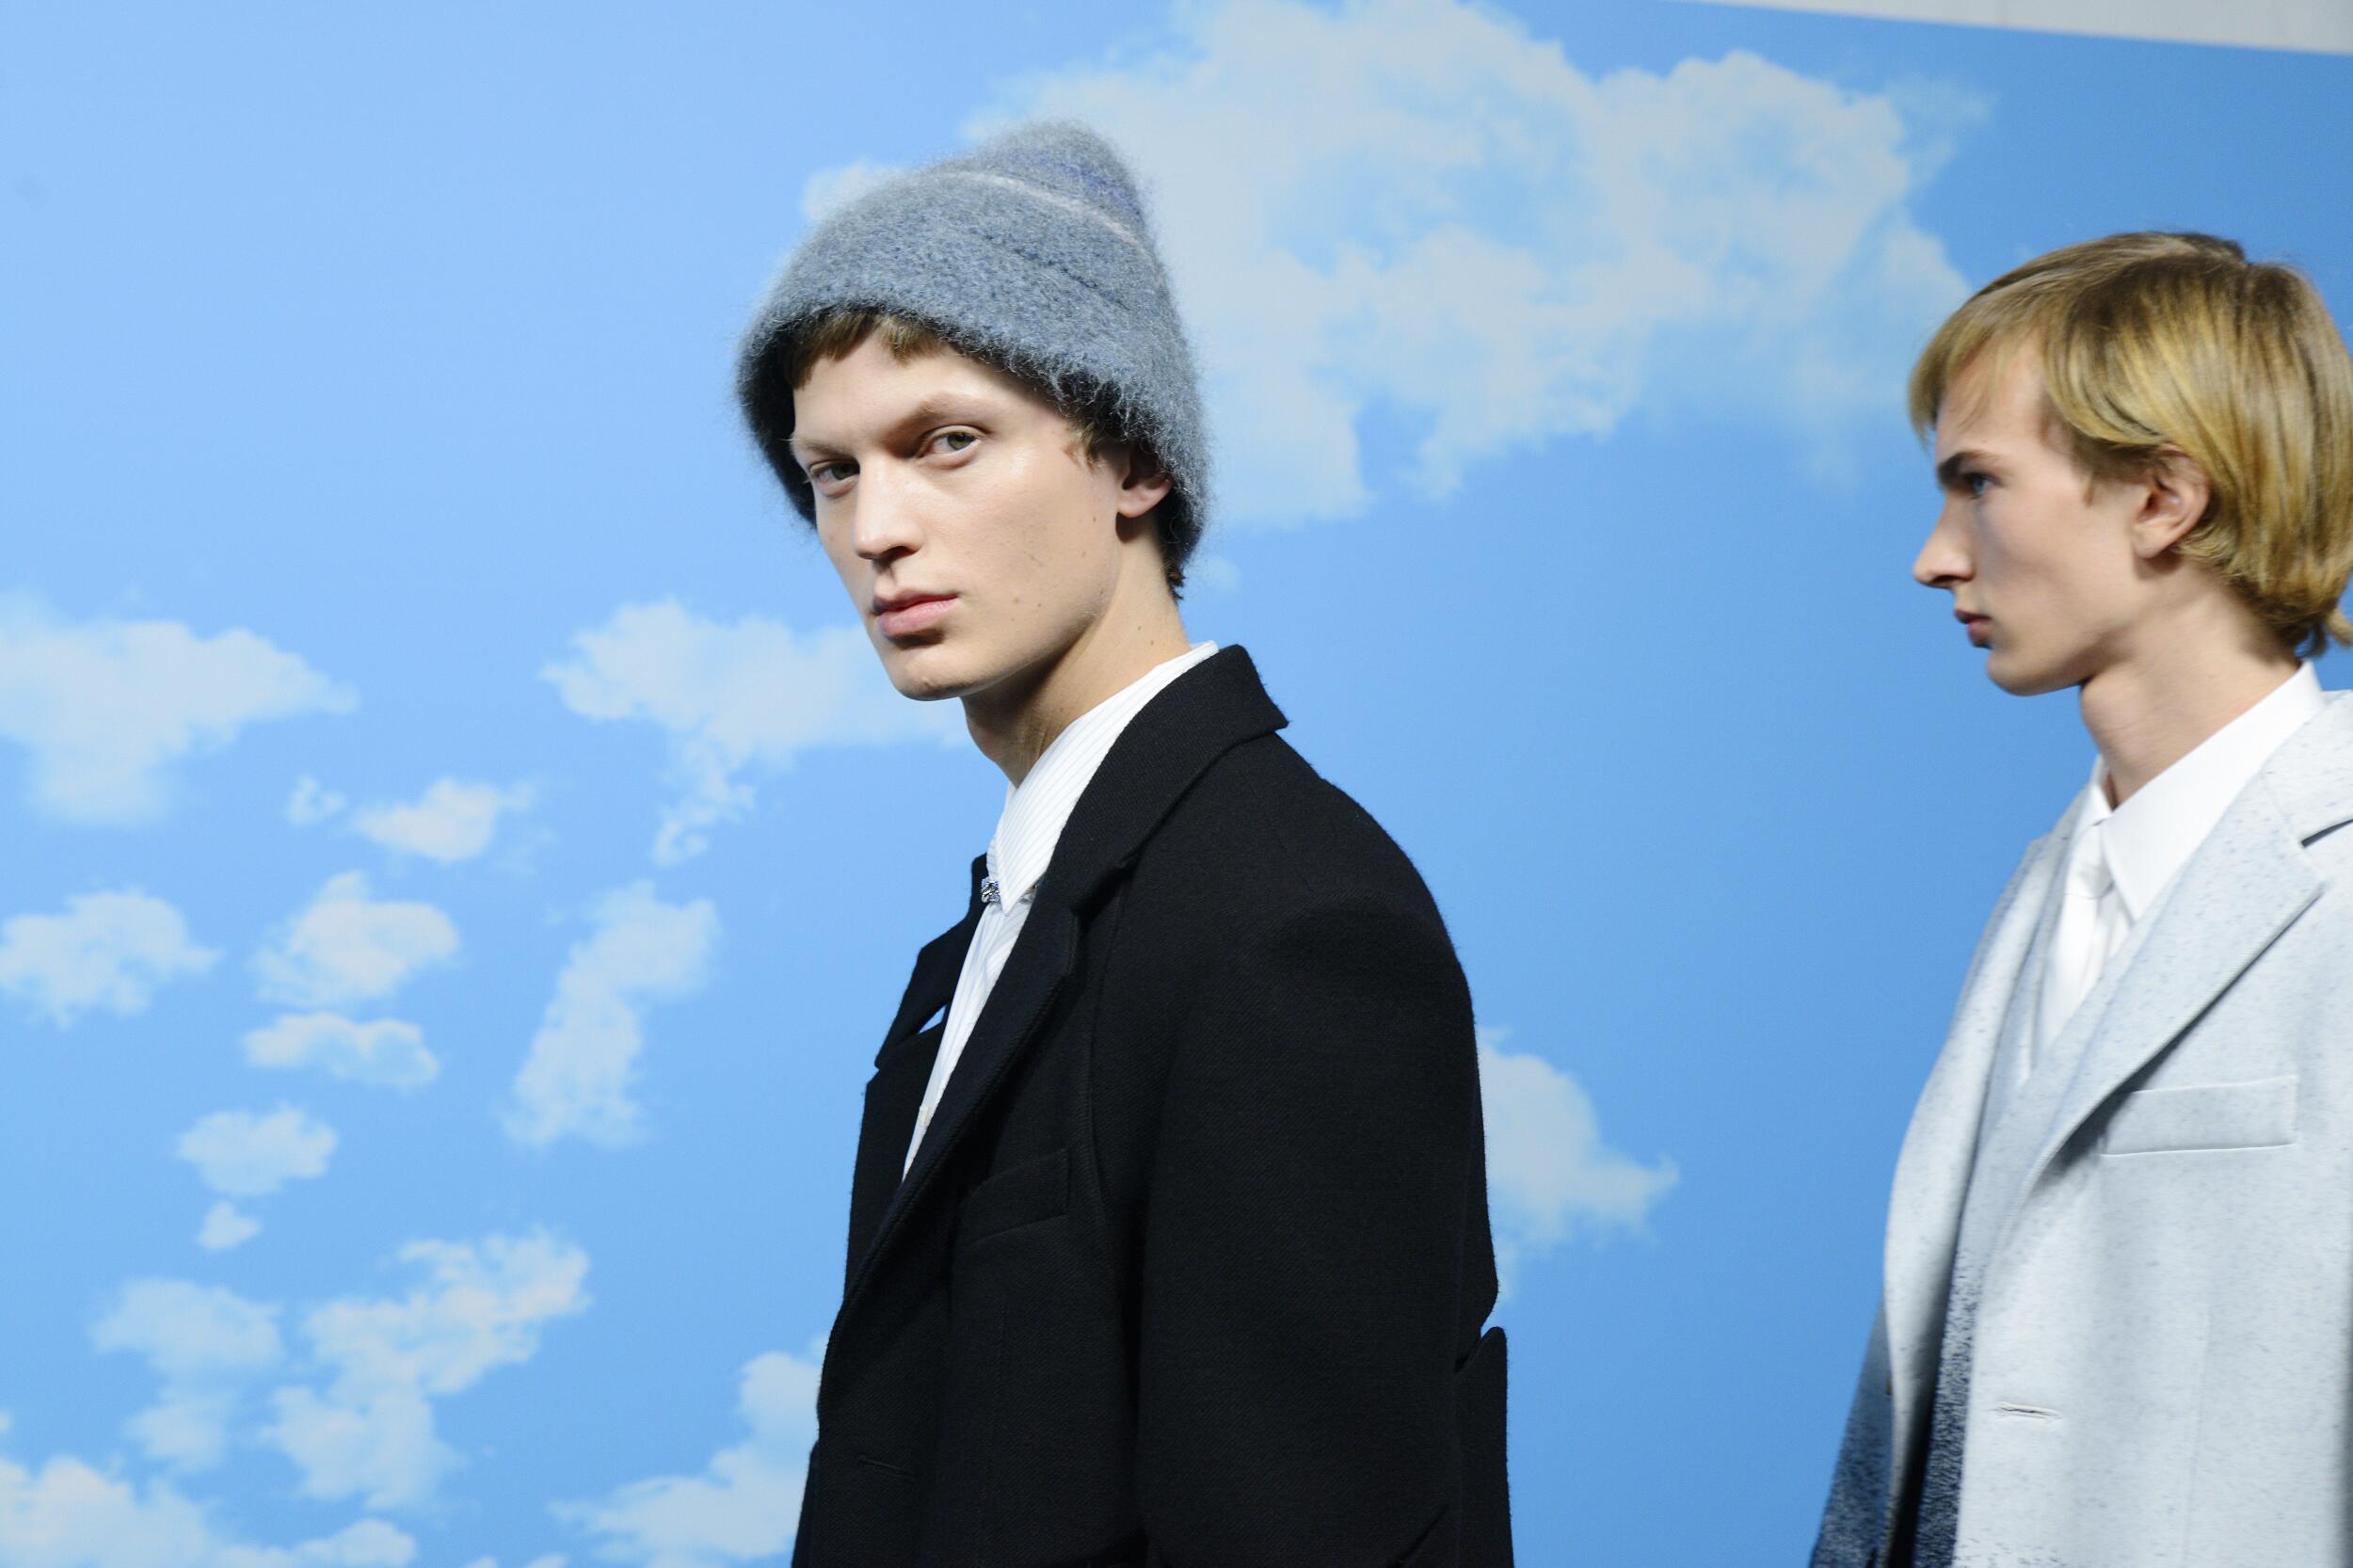 Backstage Louis Vuitton Fall Winter 2020